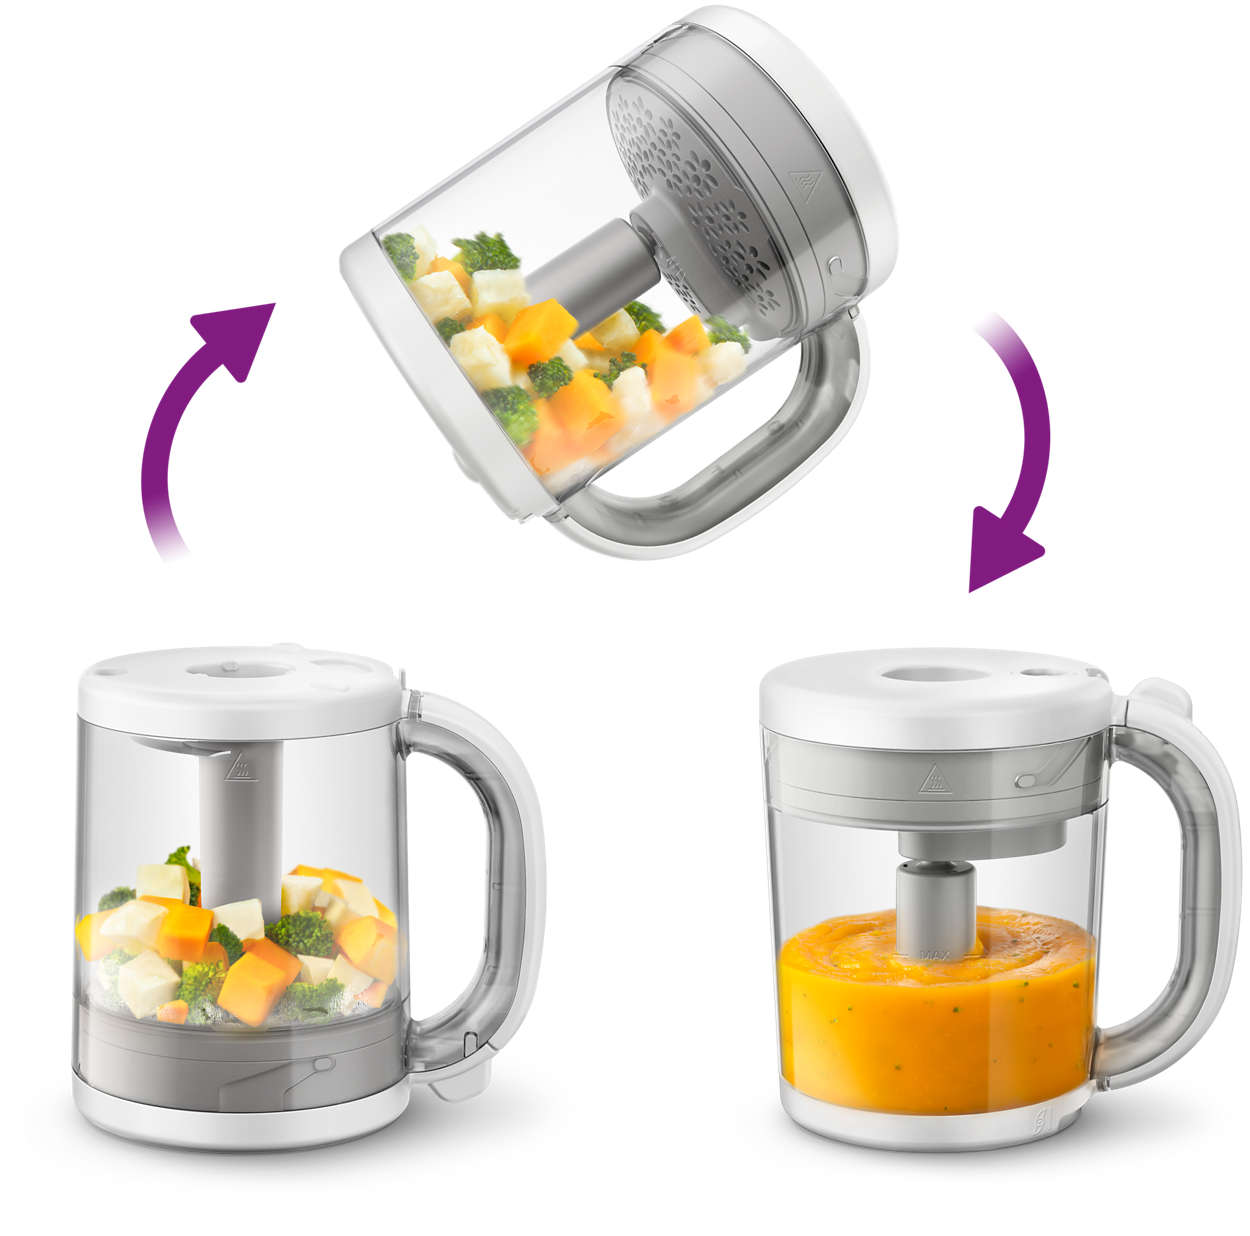 4 In 1 Healthy Baby Food Maker Scf875 01 Philips